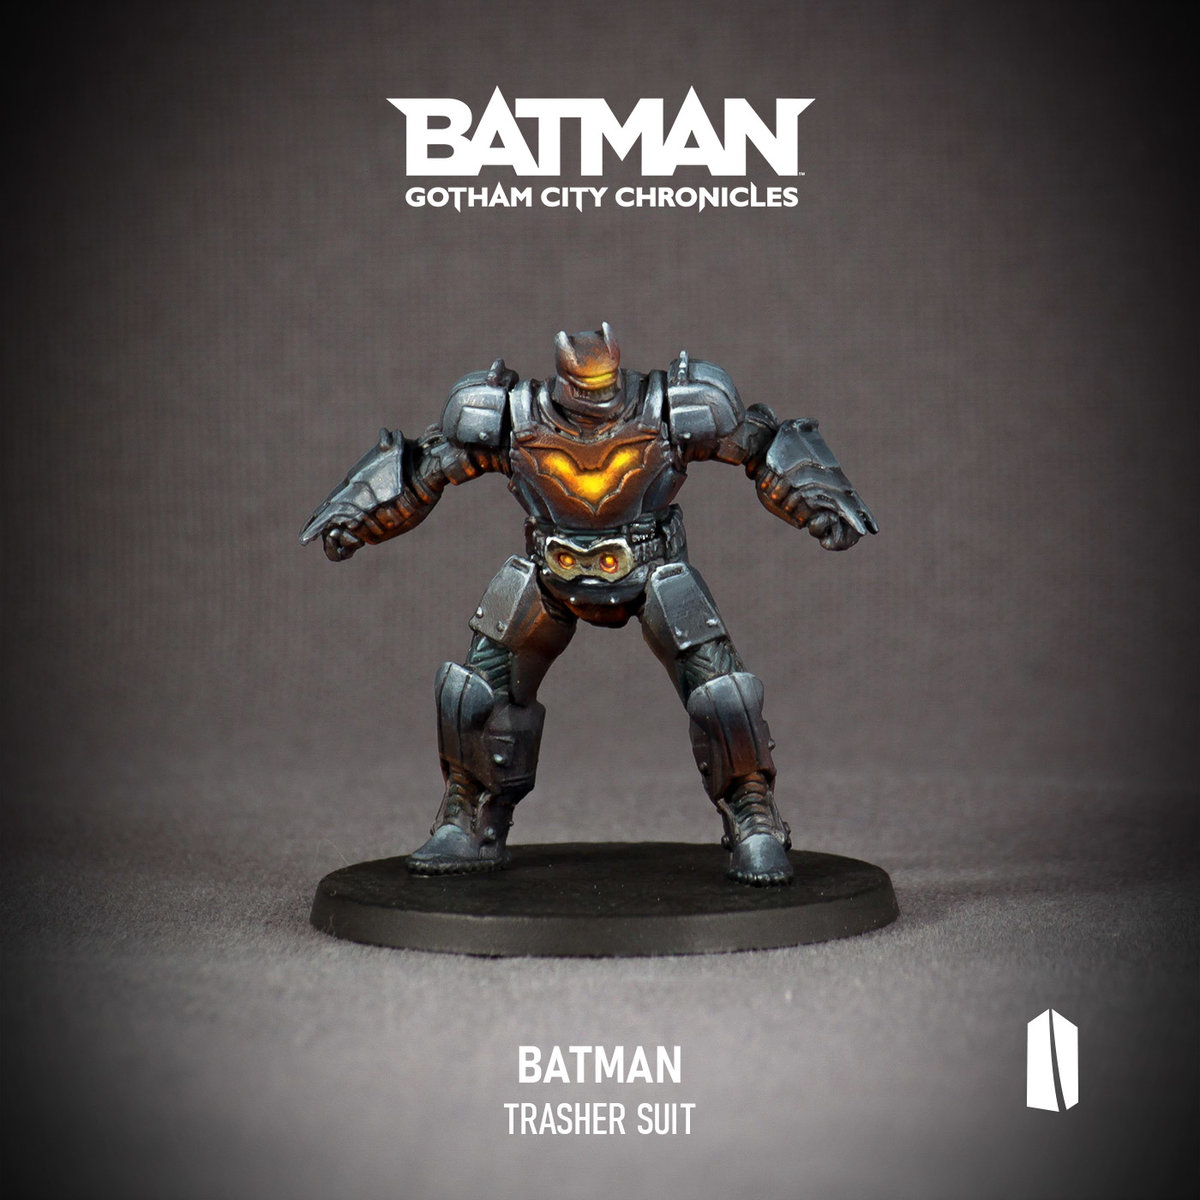 batmanGCC_trasher_suit_final.jpg